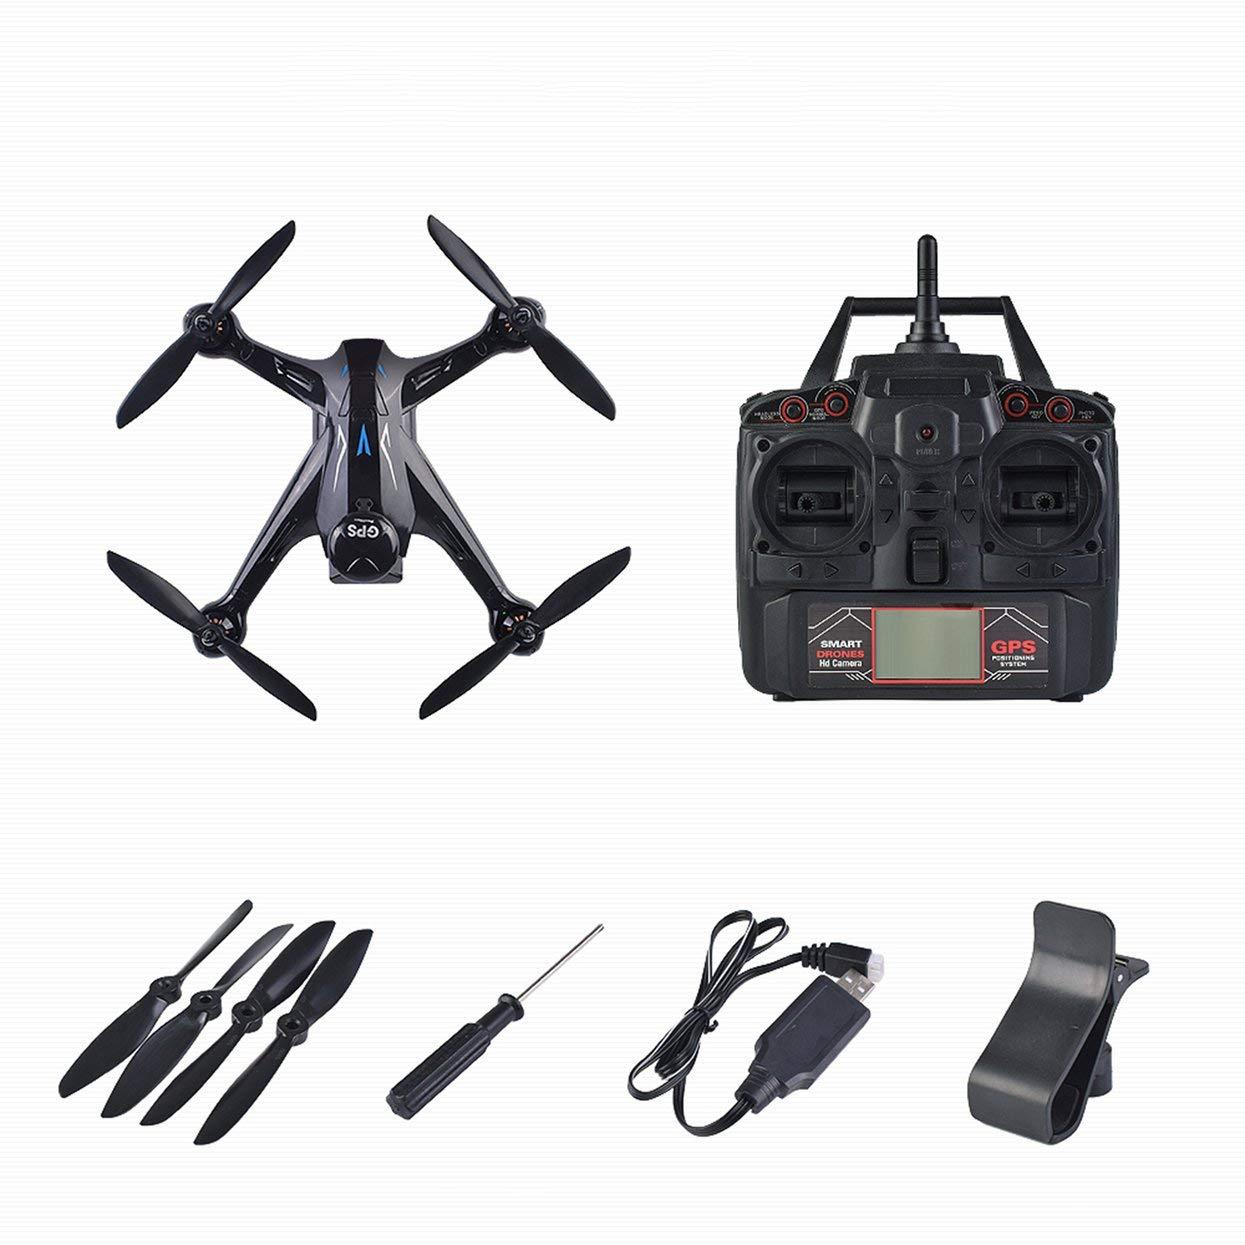 Für Drohne Ray X198 GPS Drone Vier Achsen Flugzeuge mit fester Höhe 720 P WiFi Kamera Quadrocopter RC Drone